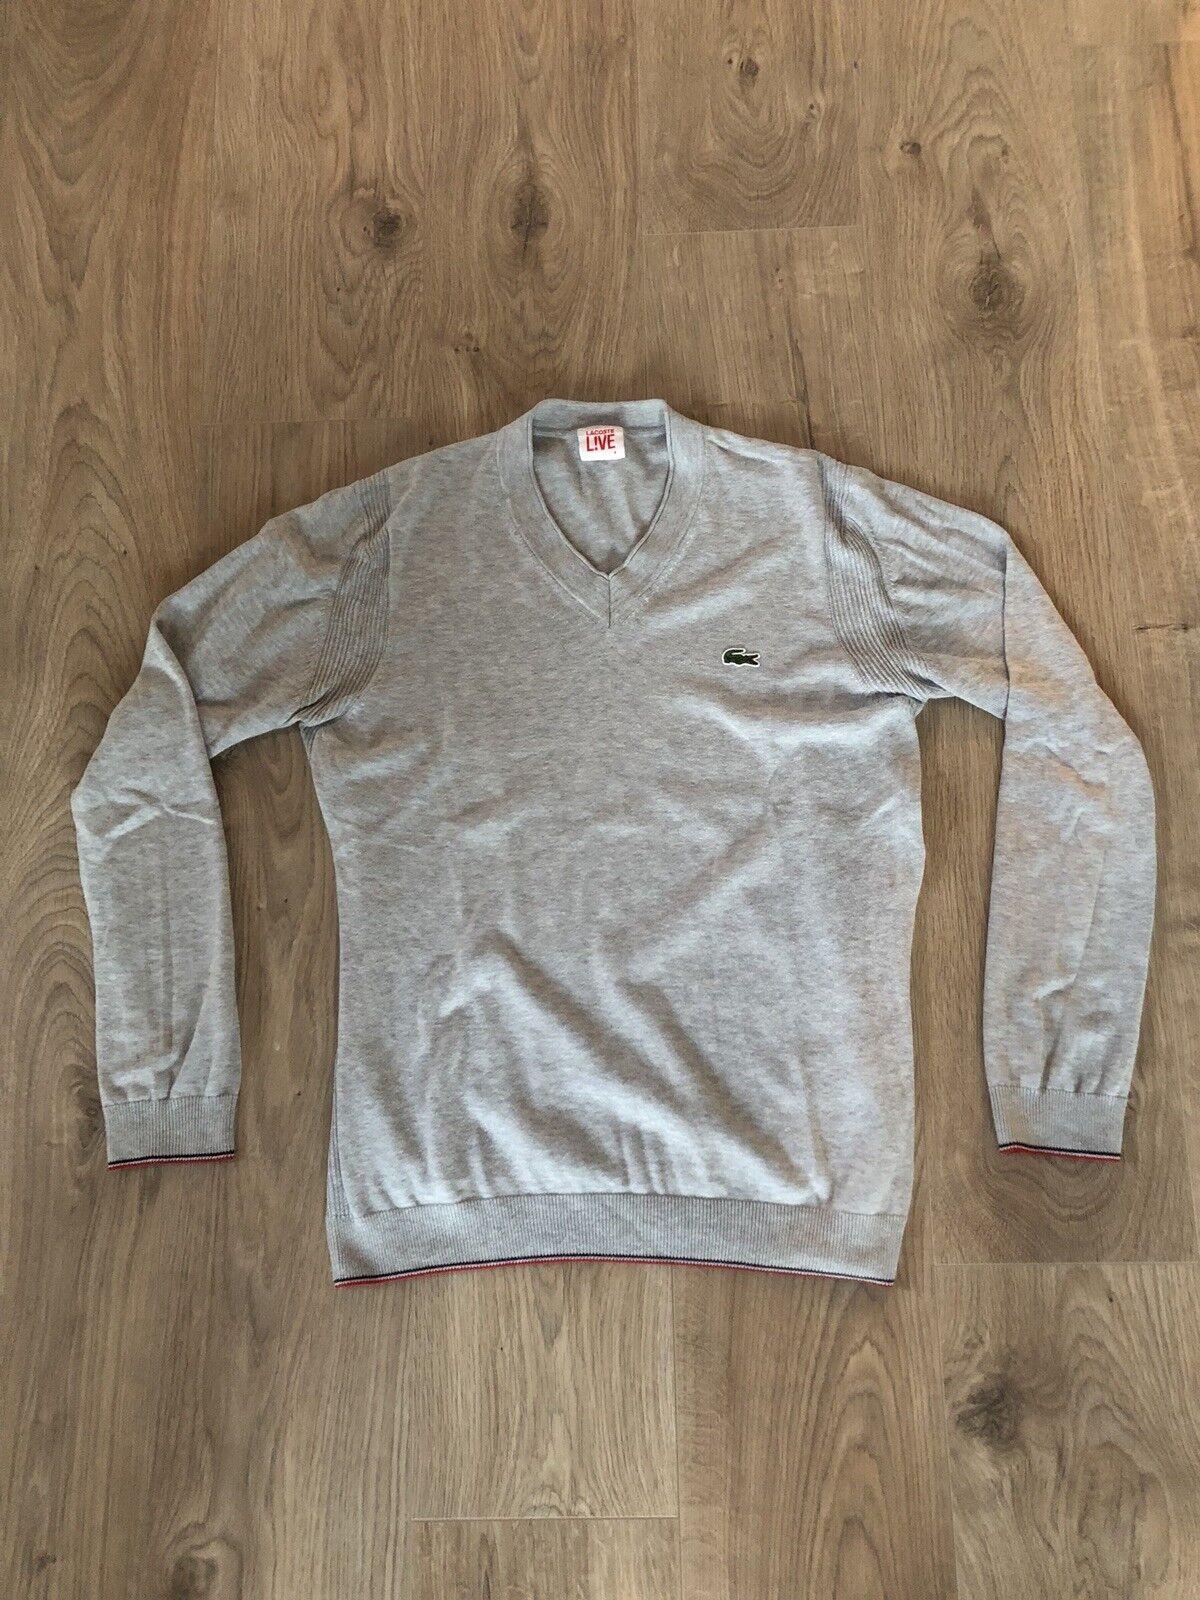 Lacoste Herren Sweatshirt Gr. 4 / S in Grau